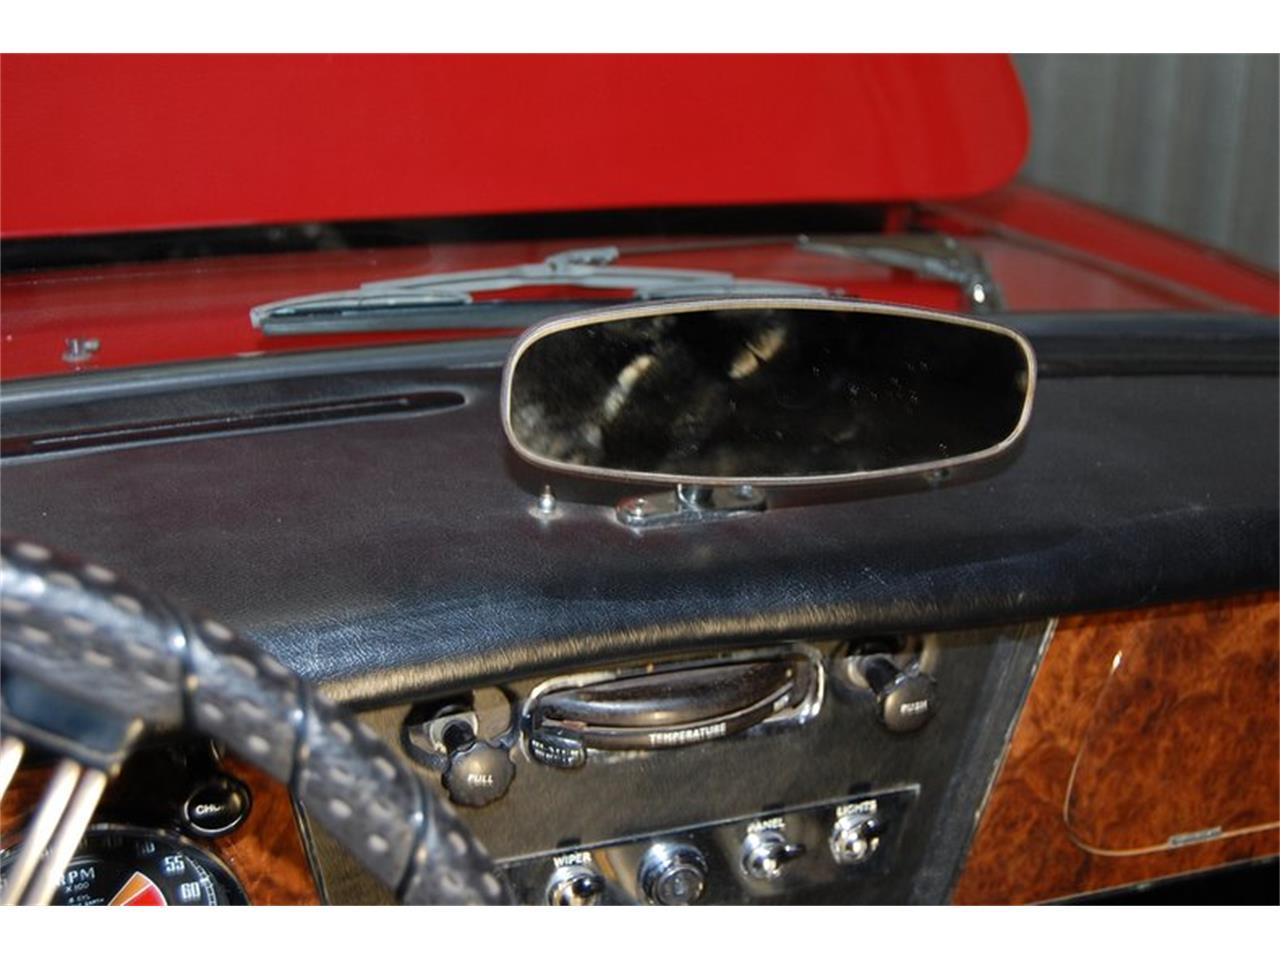 1967 Austin-Healey 3000 Mark III BJ8 (CC-1251502) for sale in Rogers, Minnesota